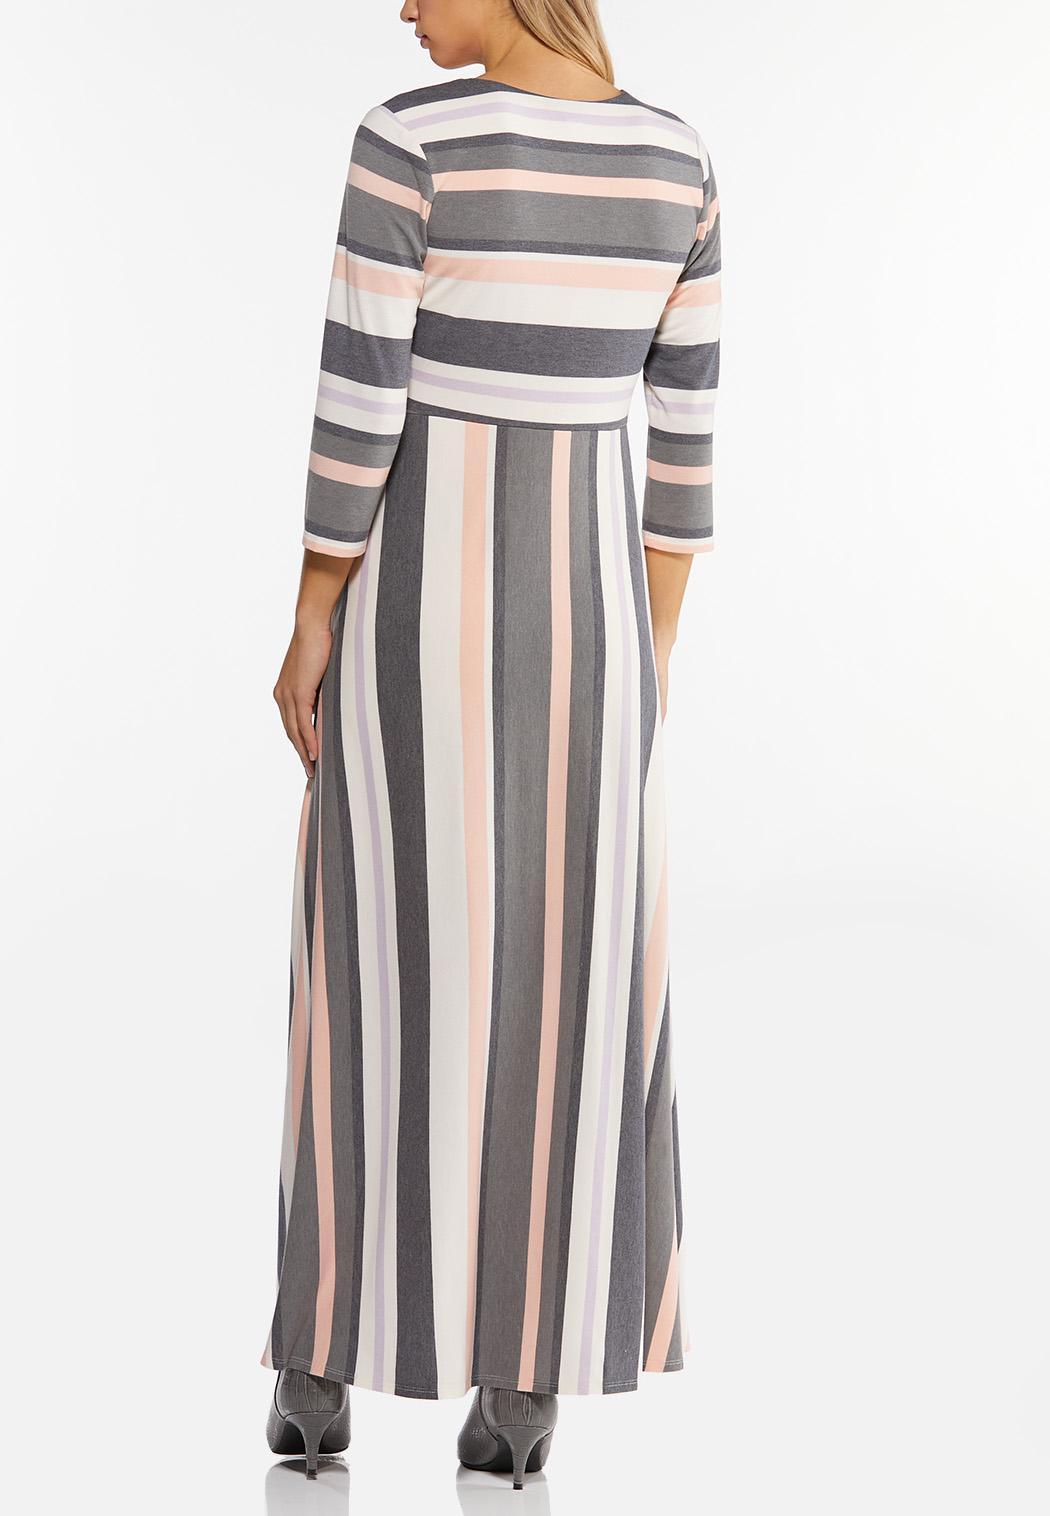 Petite Mixed Stripe Maxi Dress (Item #44463114)